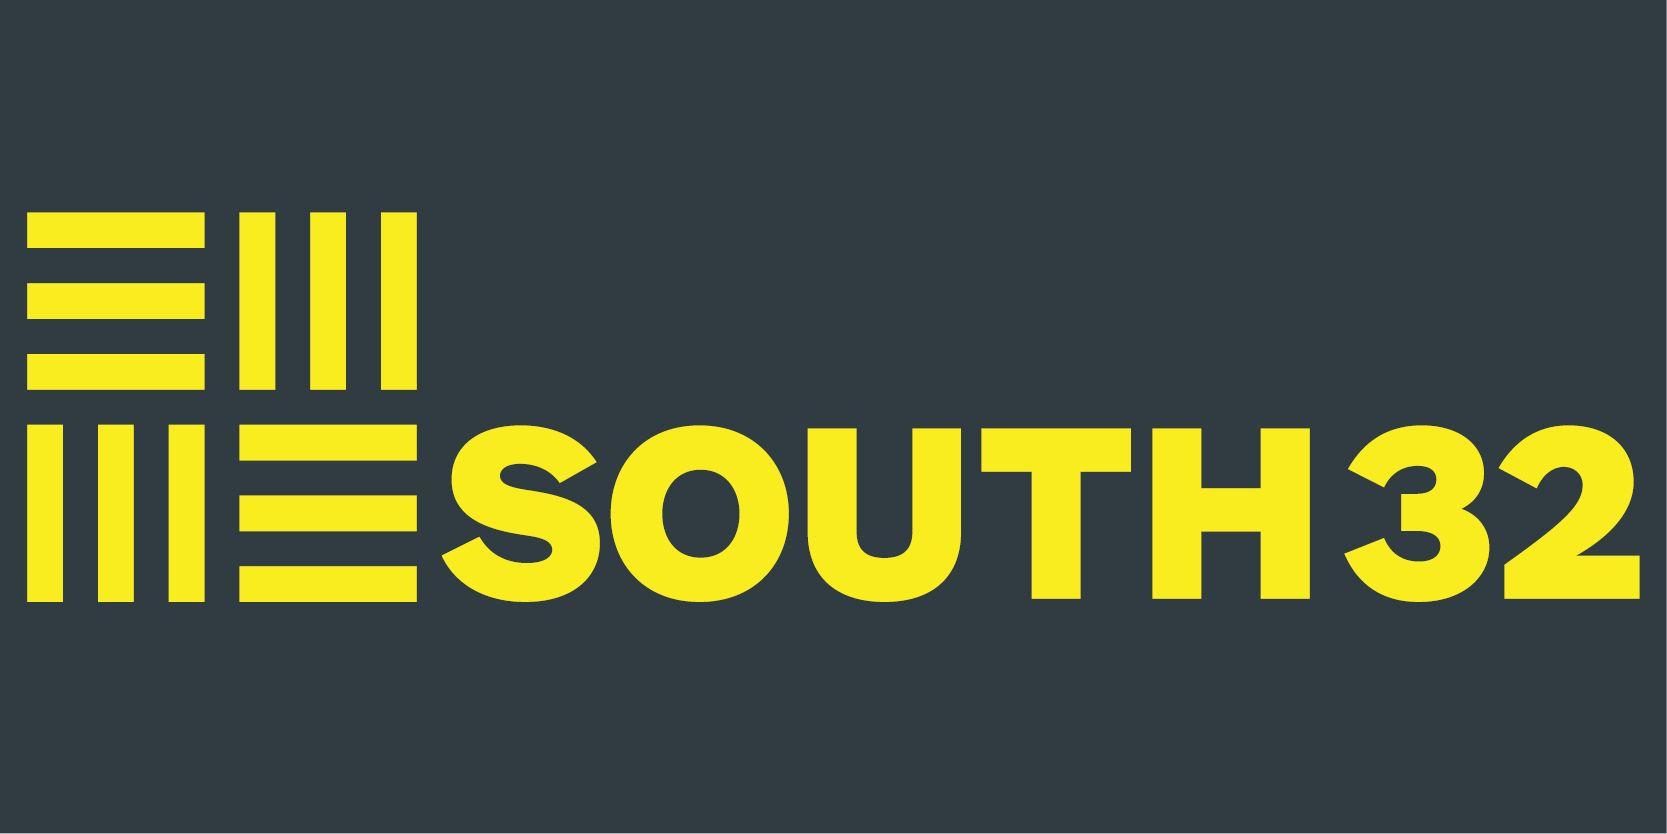 Gemco South 32 Logo